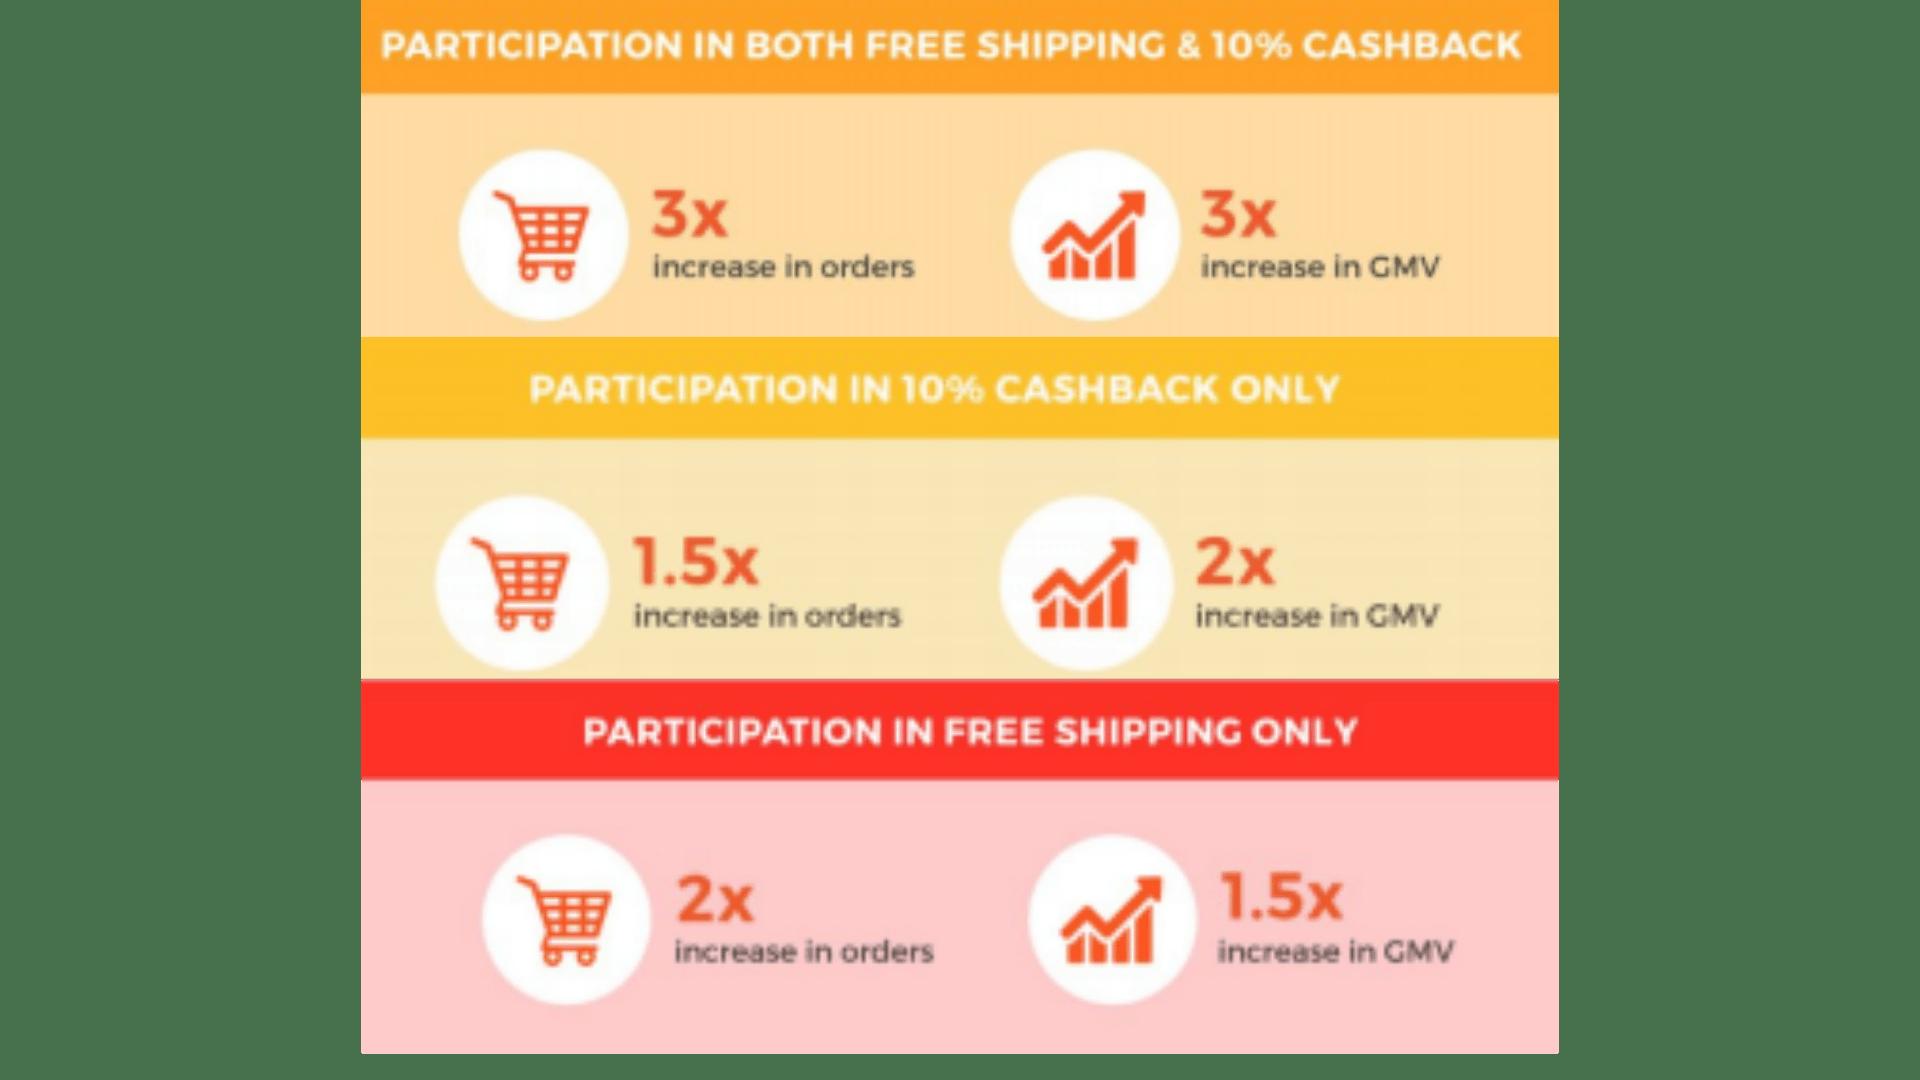 Shopee Enhanced Coins Cashback